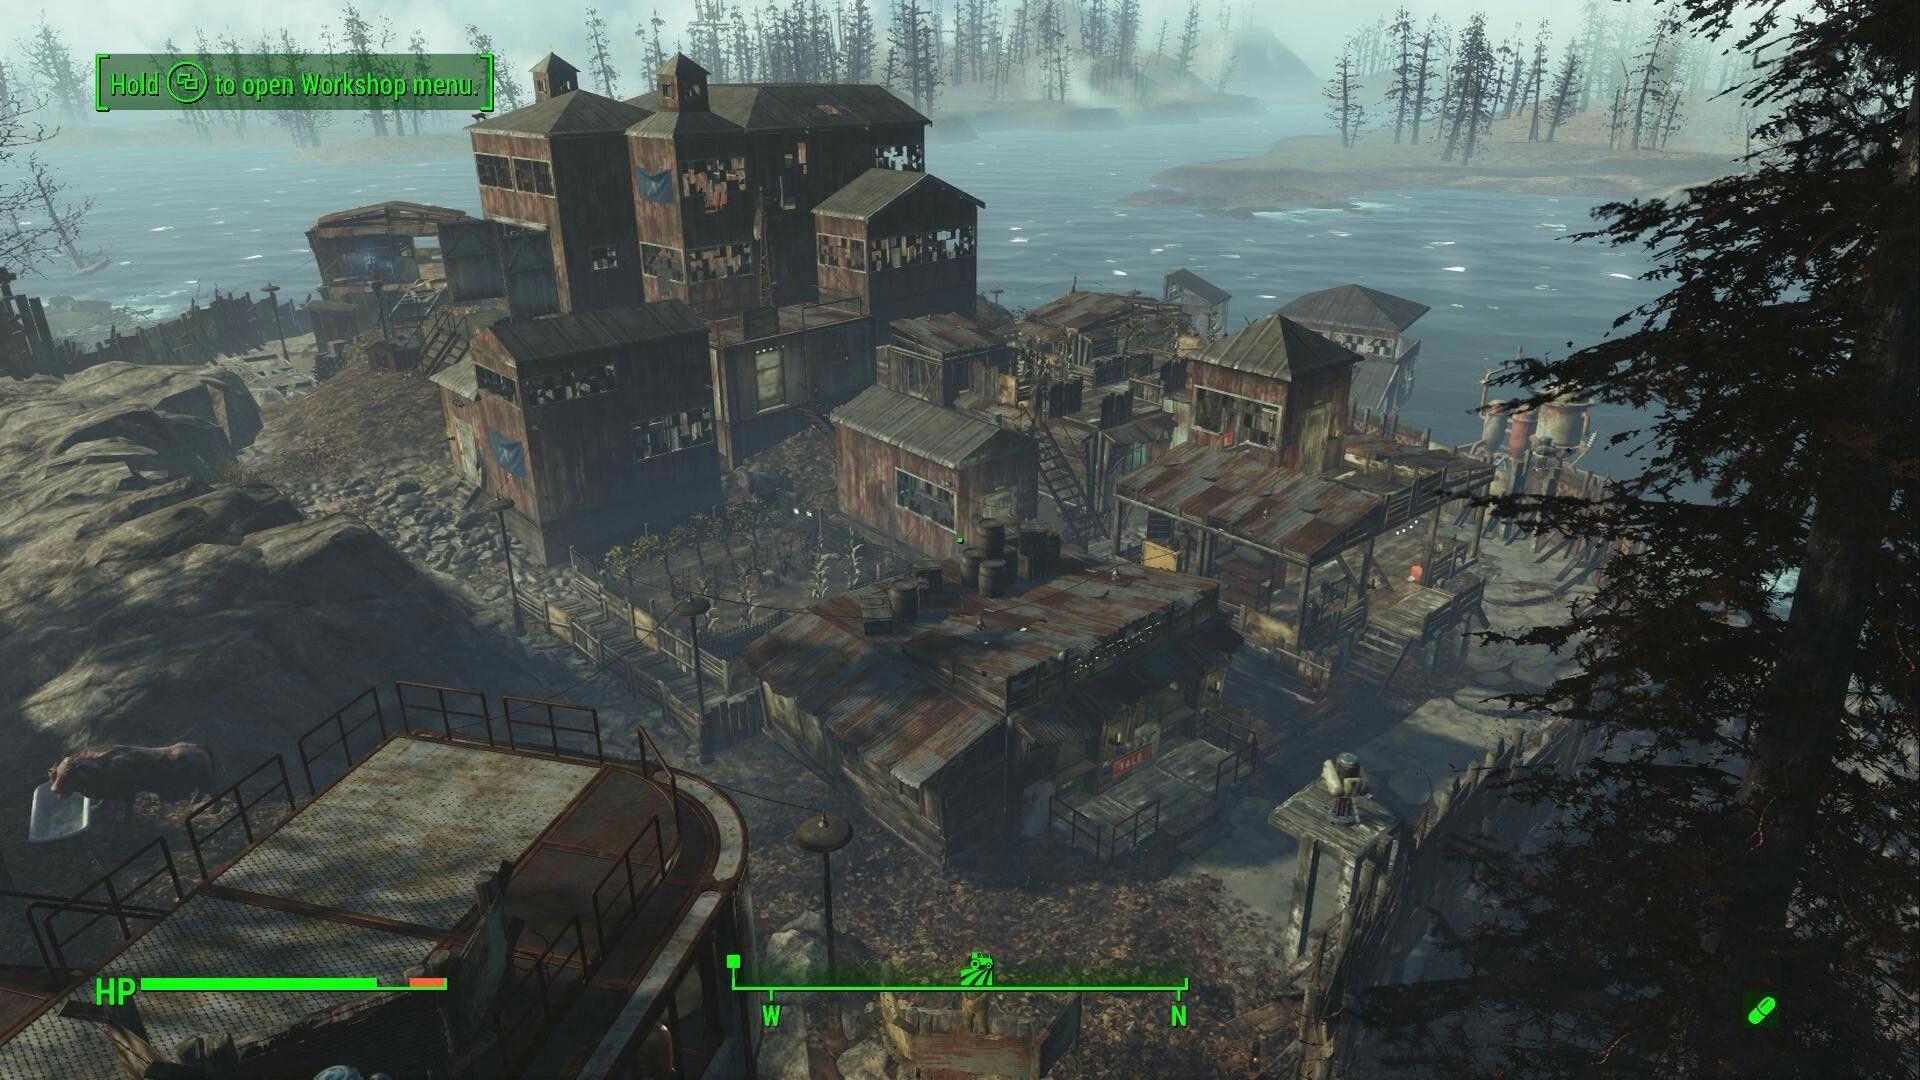 Pin By Zach Shepard On Fallout 4 Settlement Ideas Fallout Fallout 4 Settlement Ideas Fallout Settlement